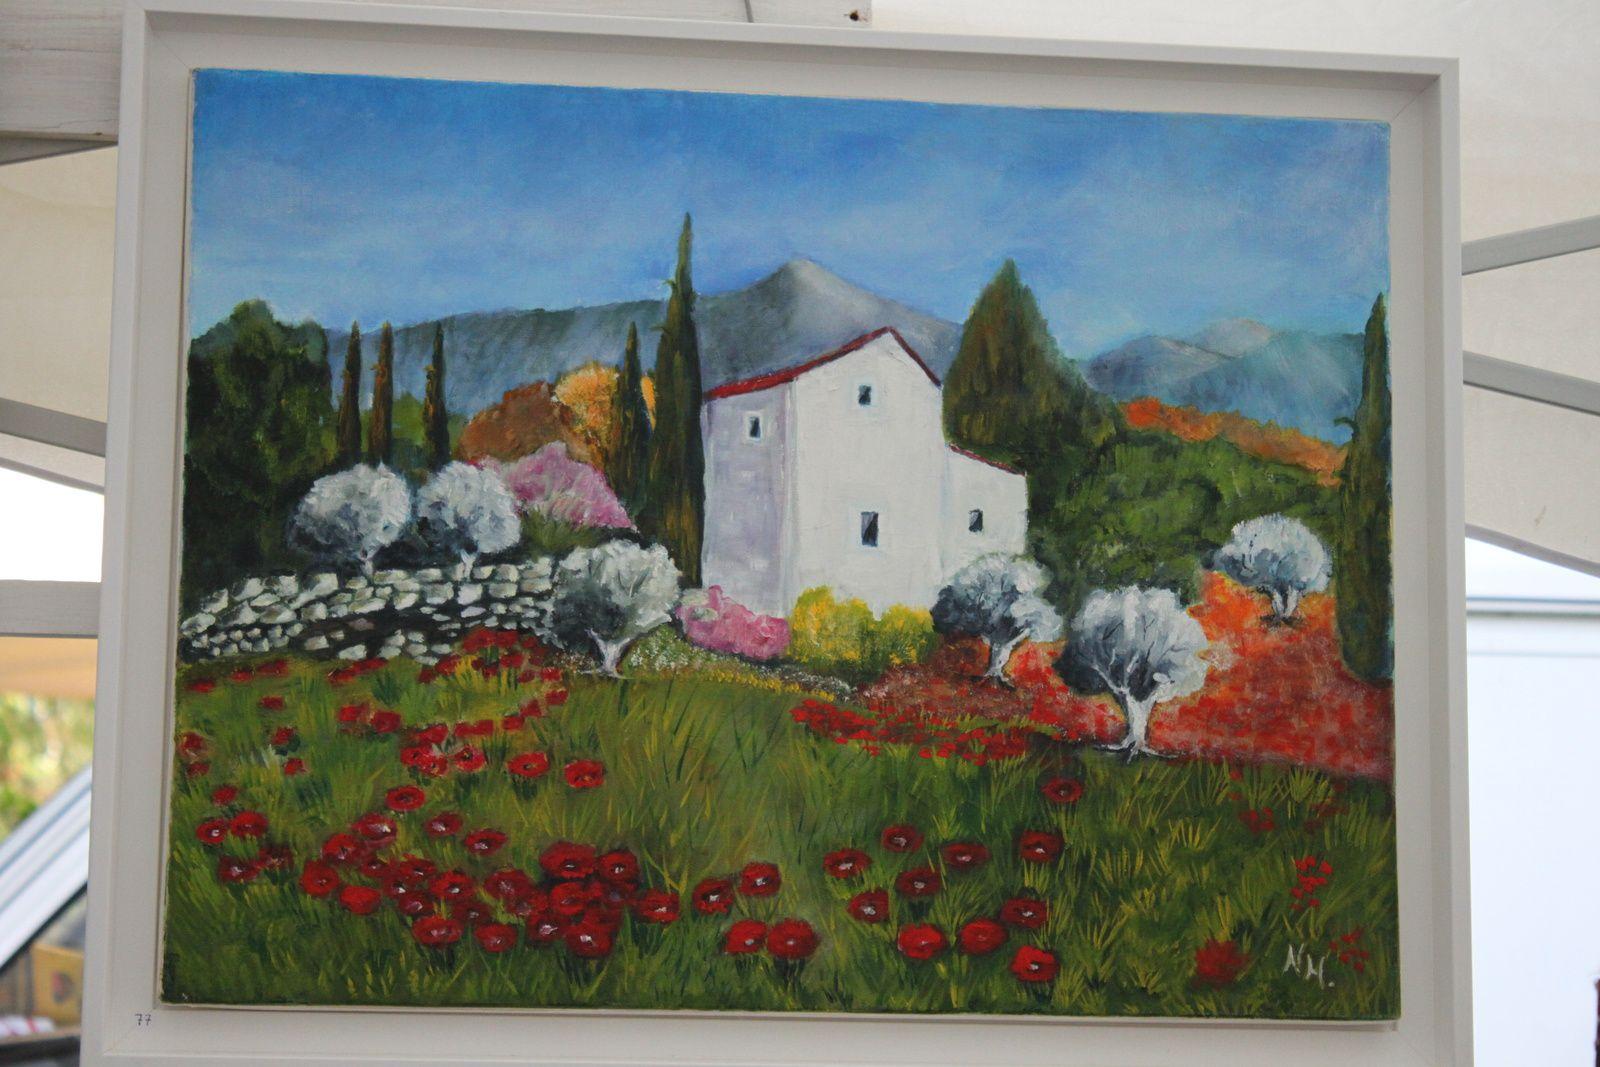 L'artiste peintre Nicole Hurtault exposera ses oeuvres le 6 Juillet